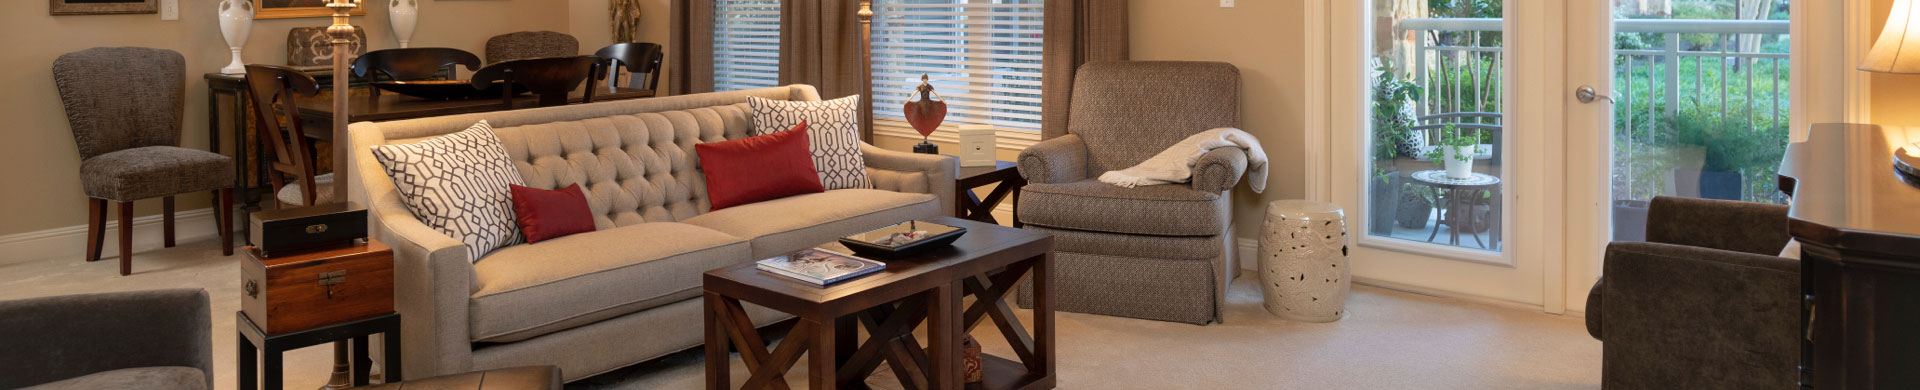 full image of living room senior independent living villa